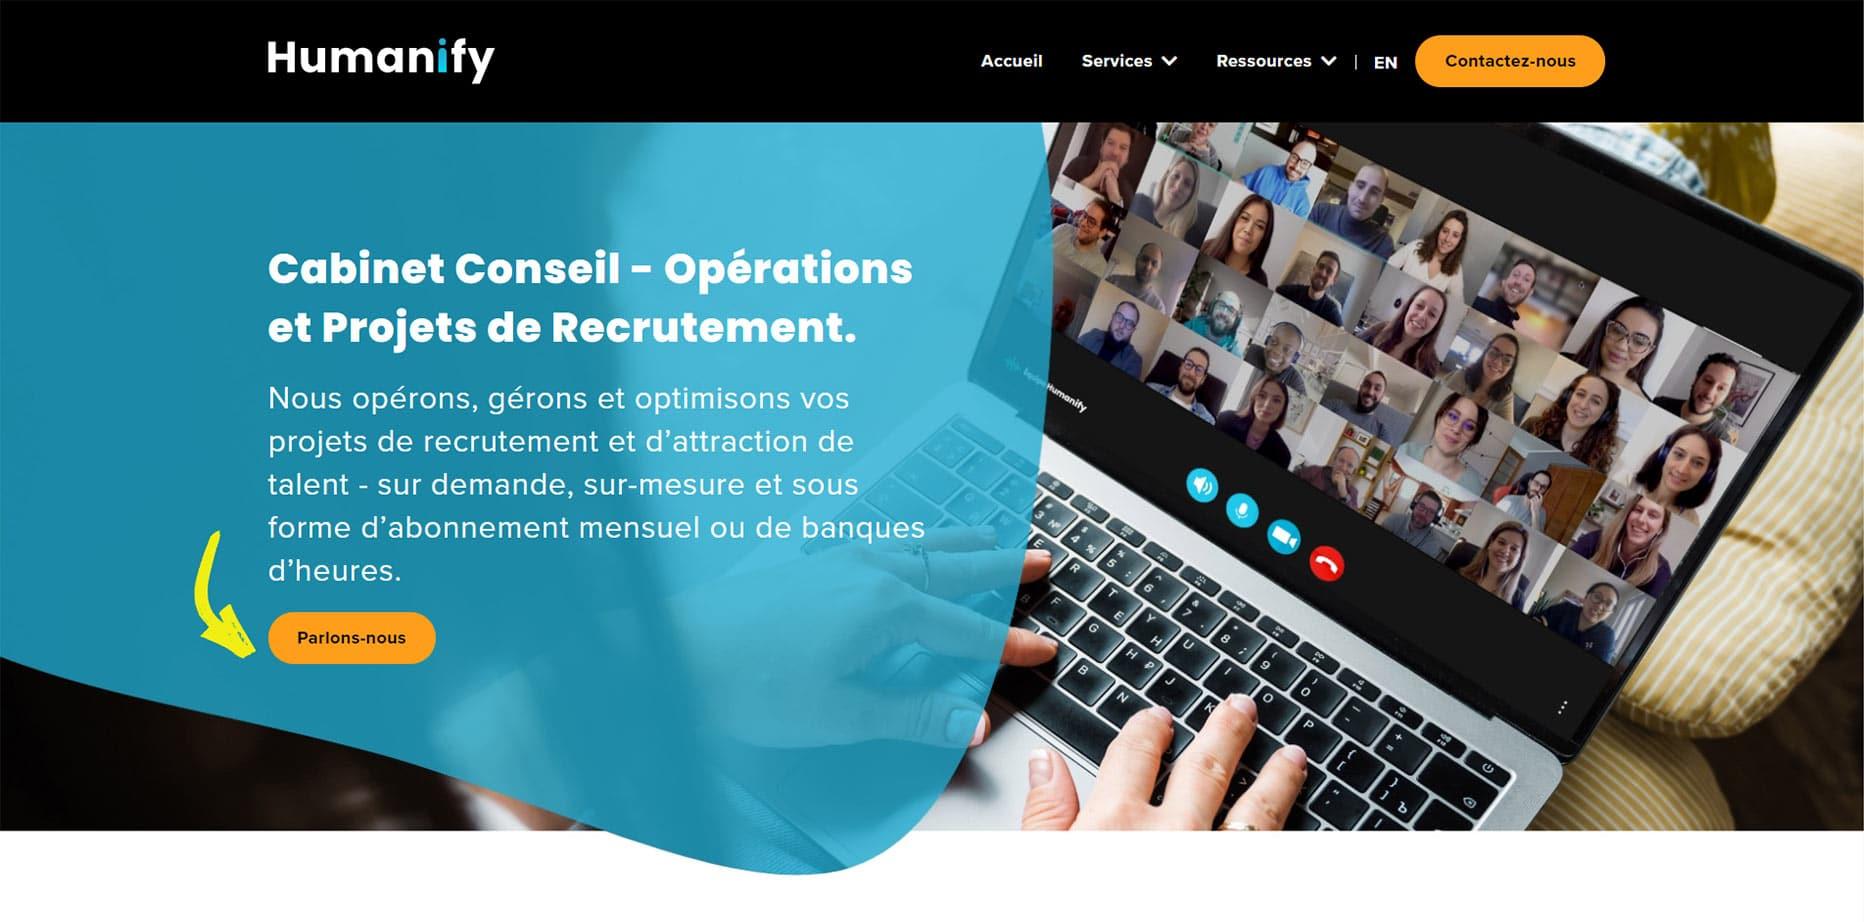 Humanify 360 - 1